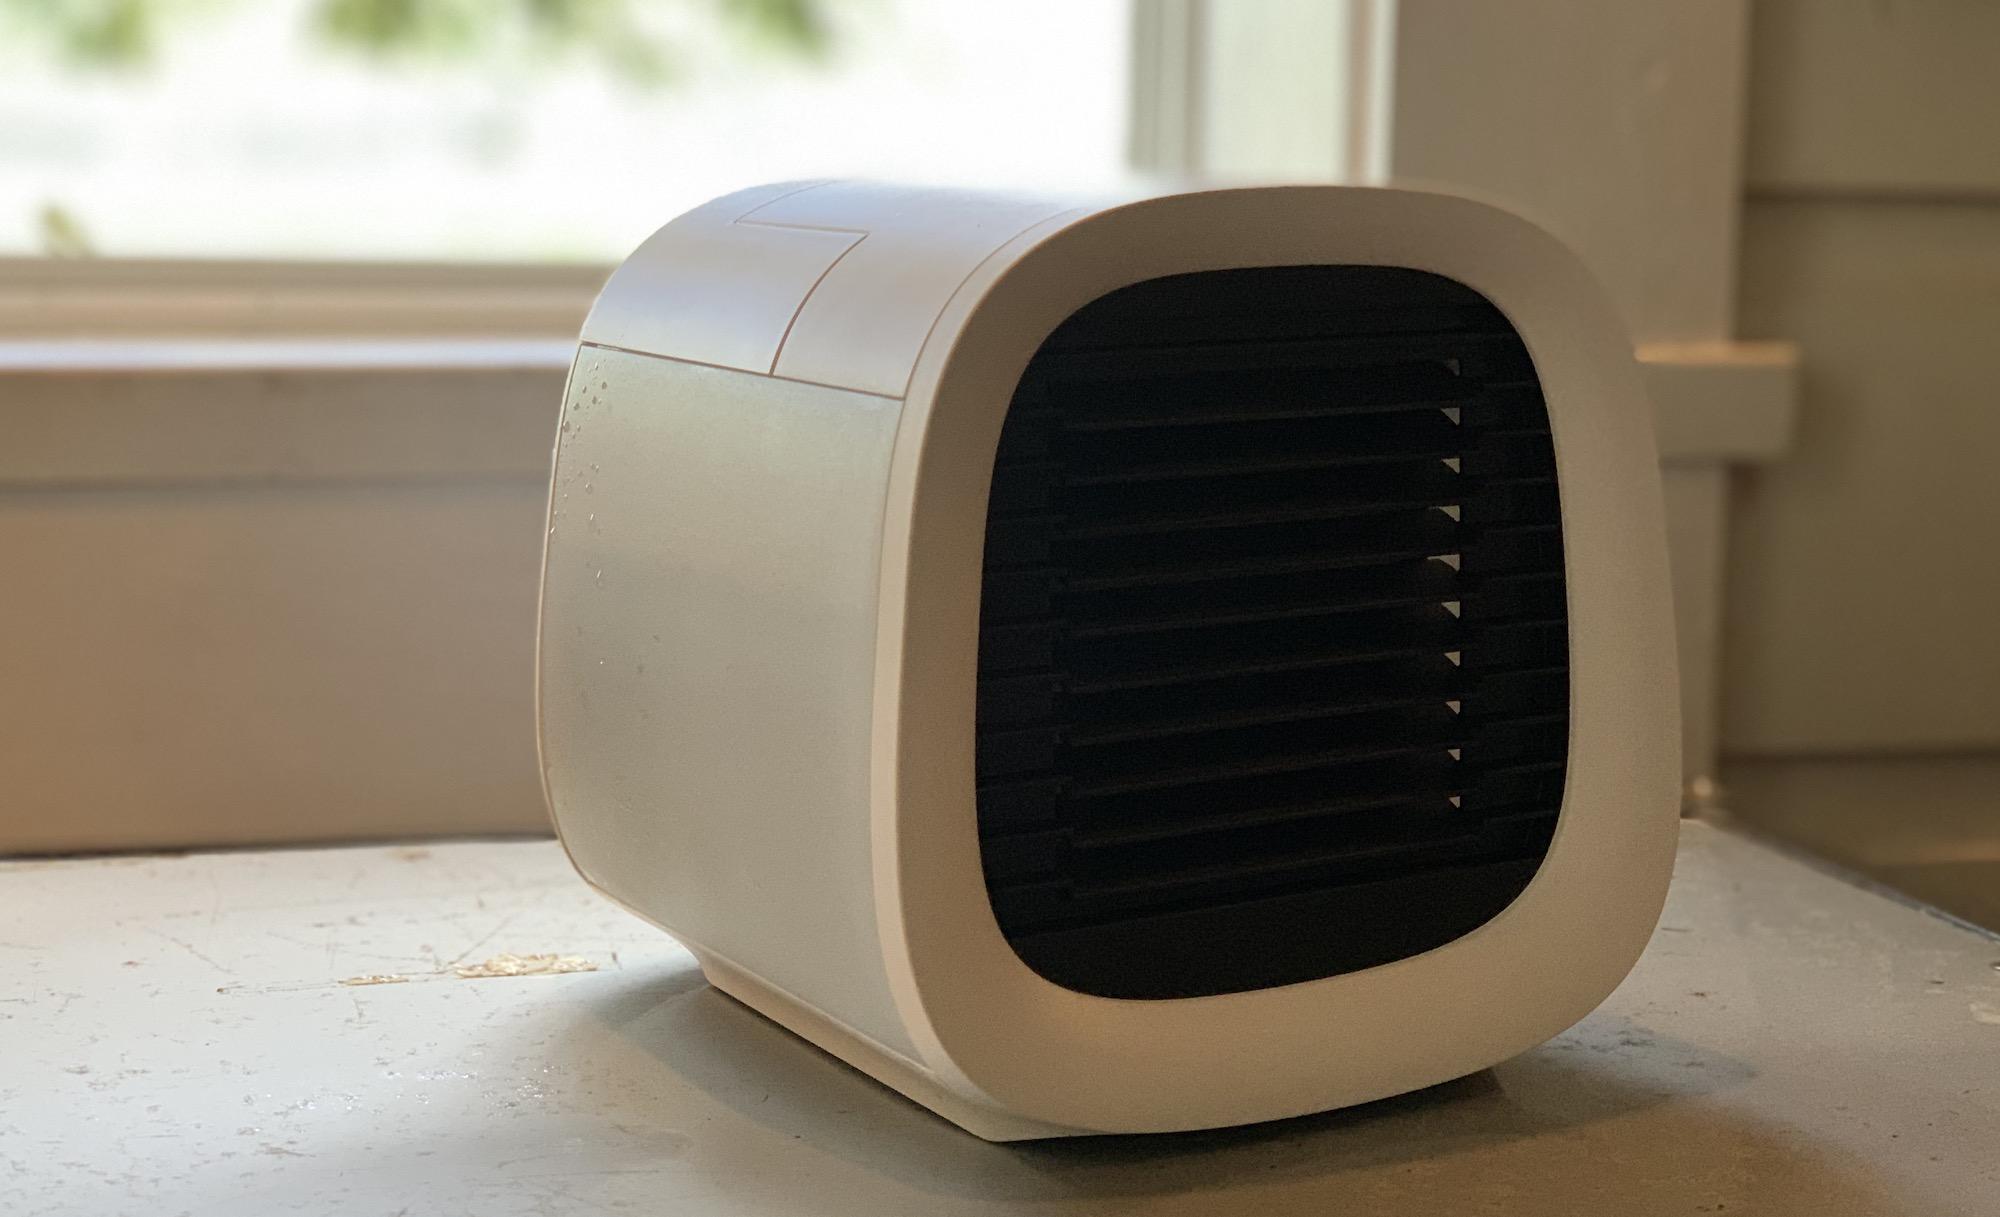 evaPolar evachill personal evaporative cooler review